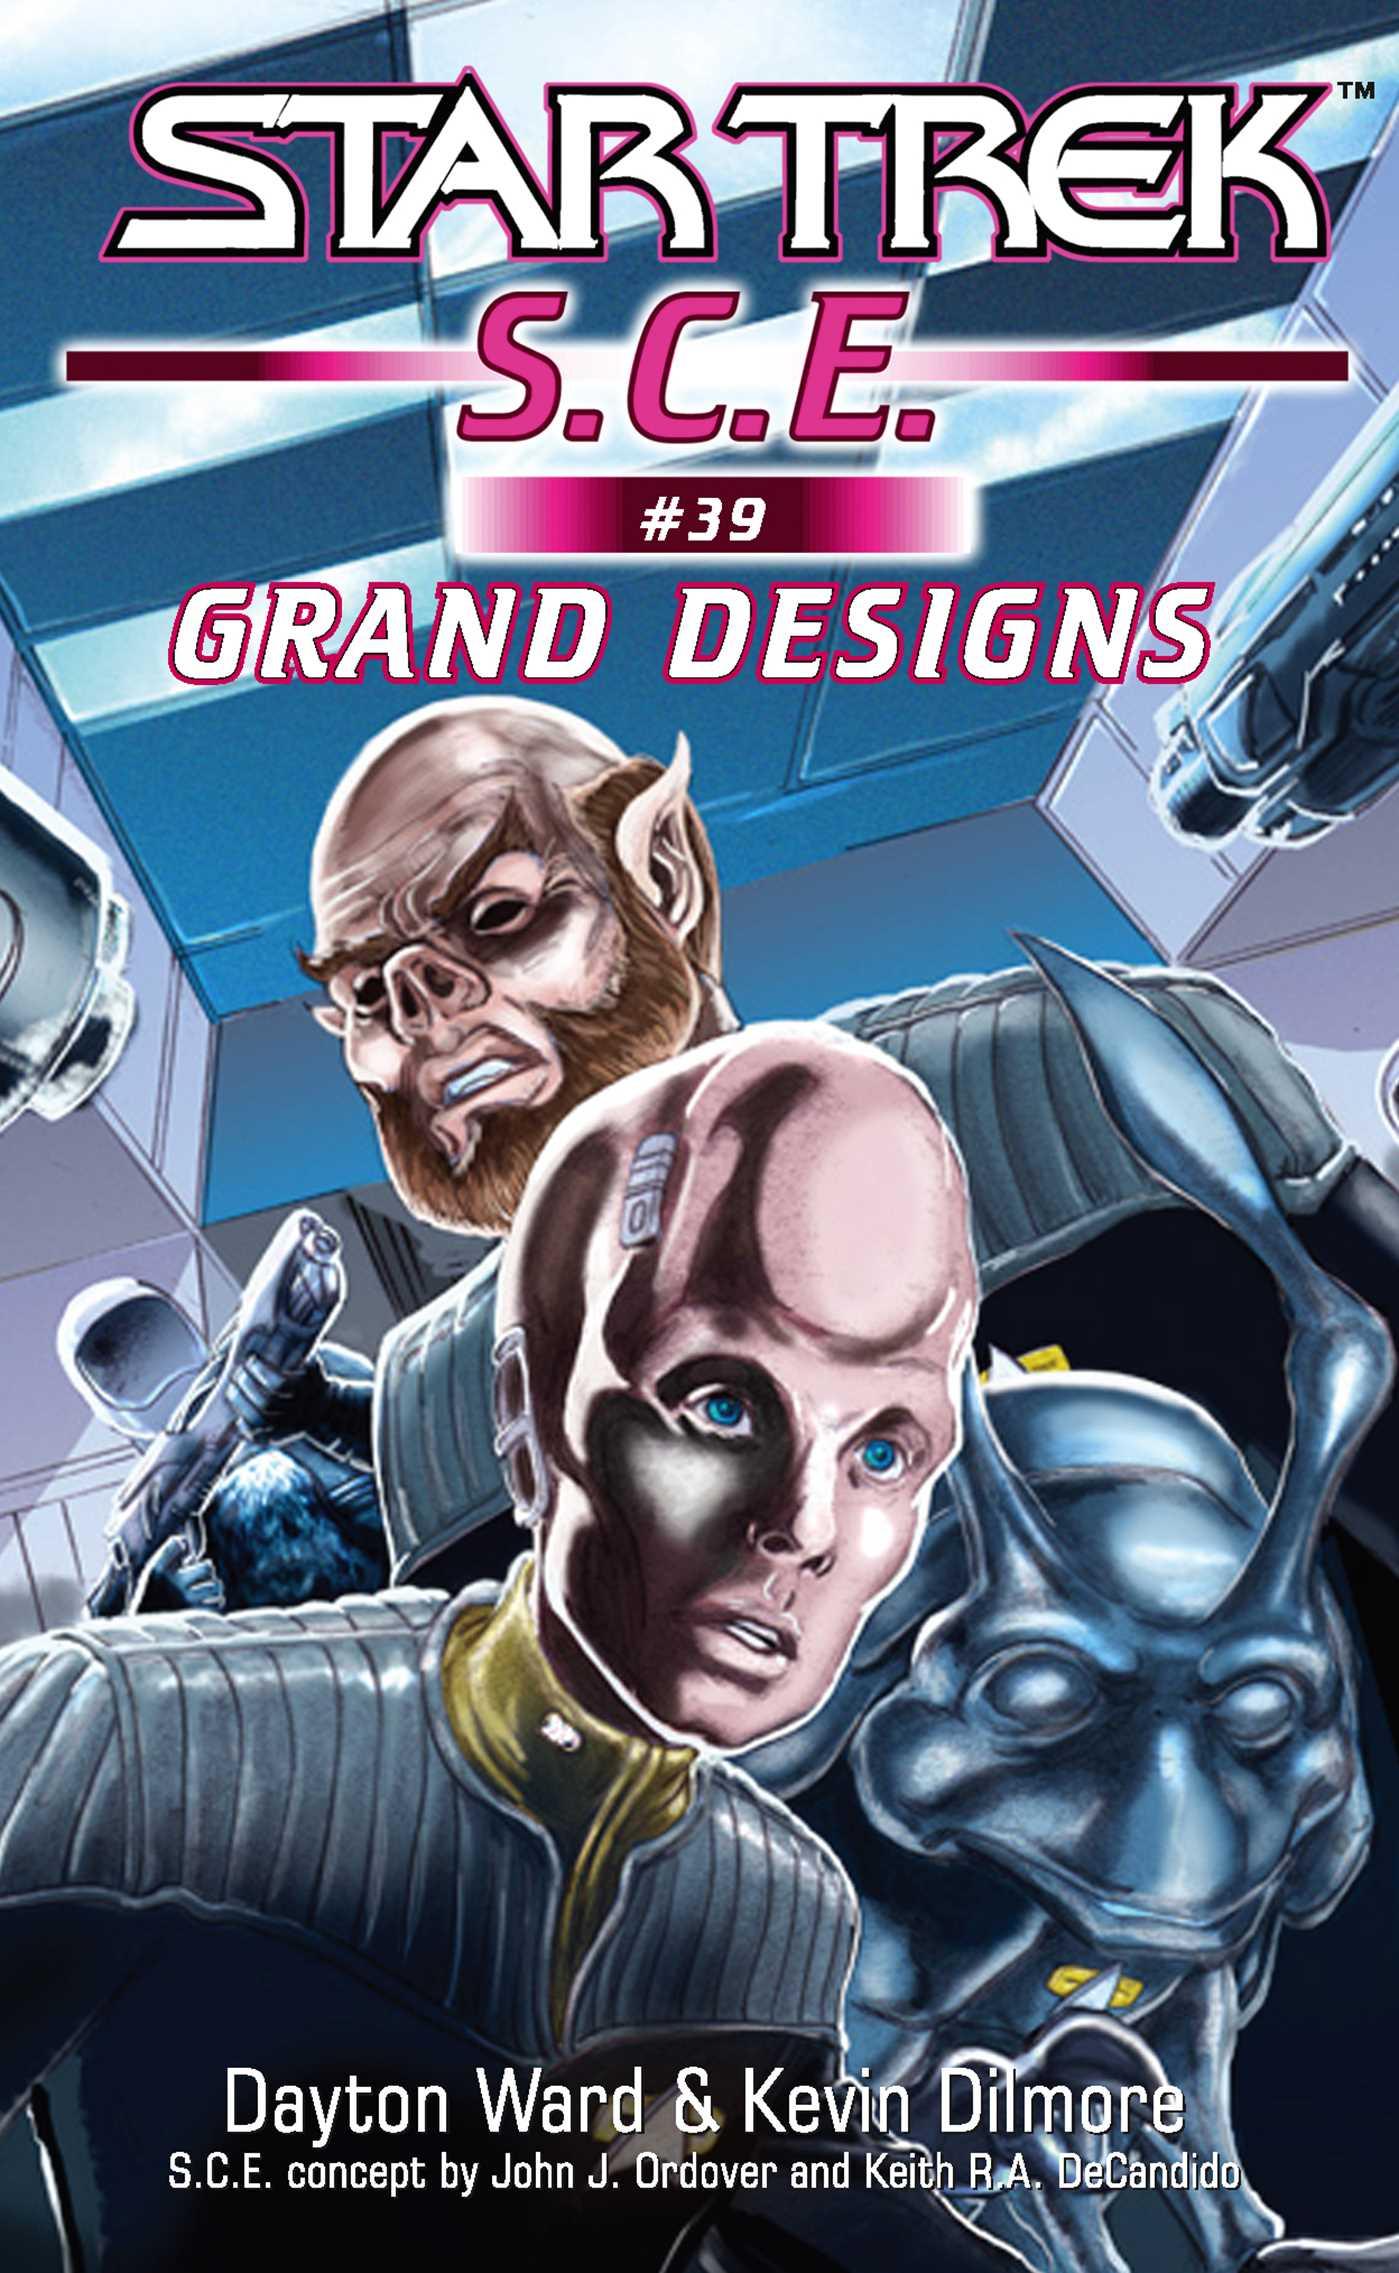 Star trek grand designs 9780743480864 hr